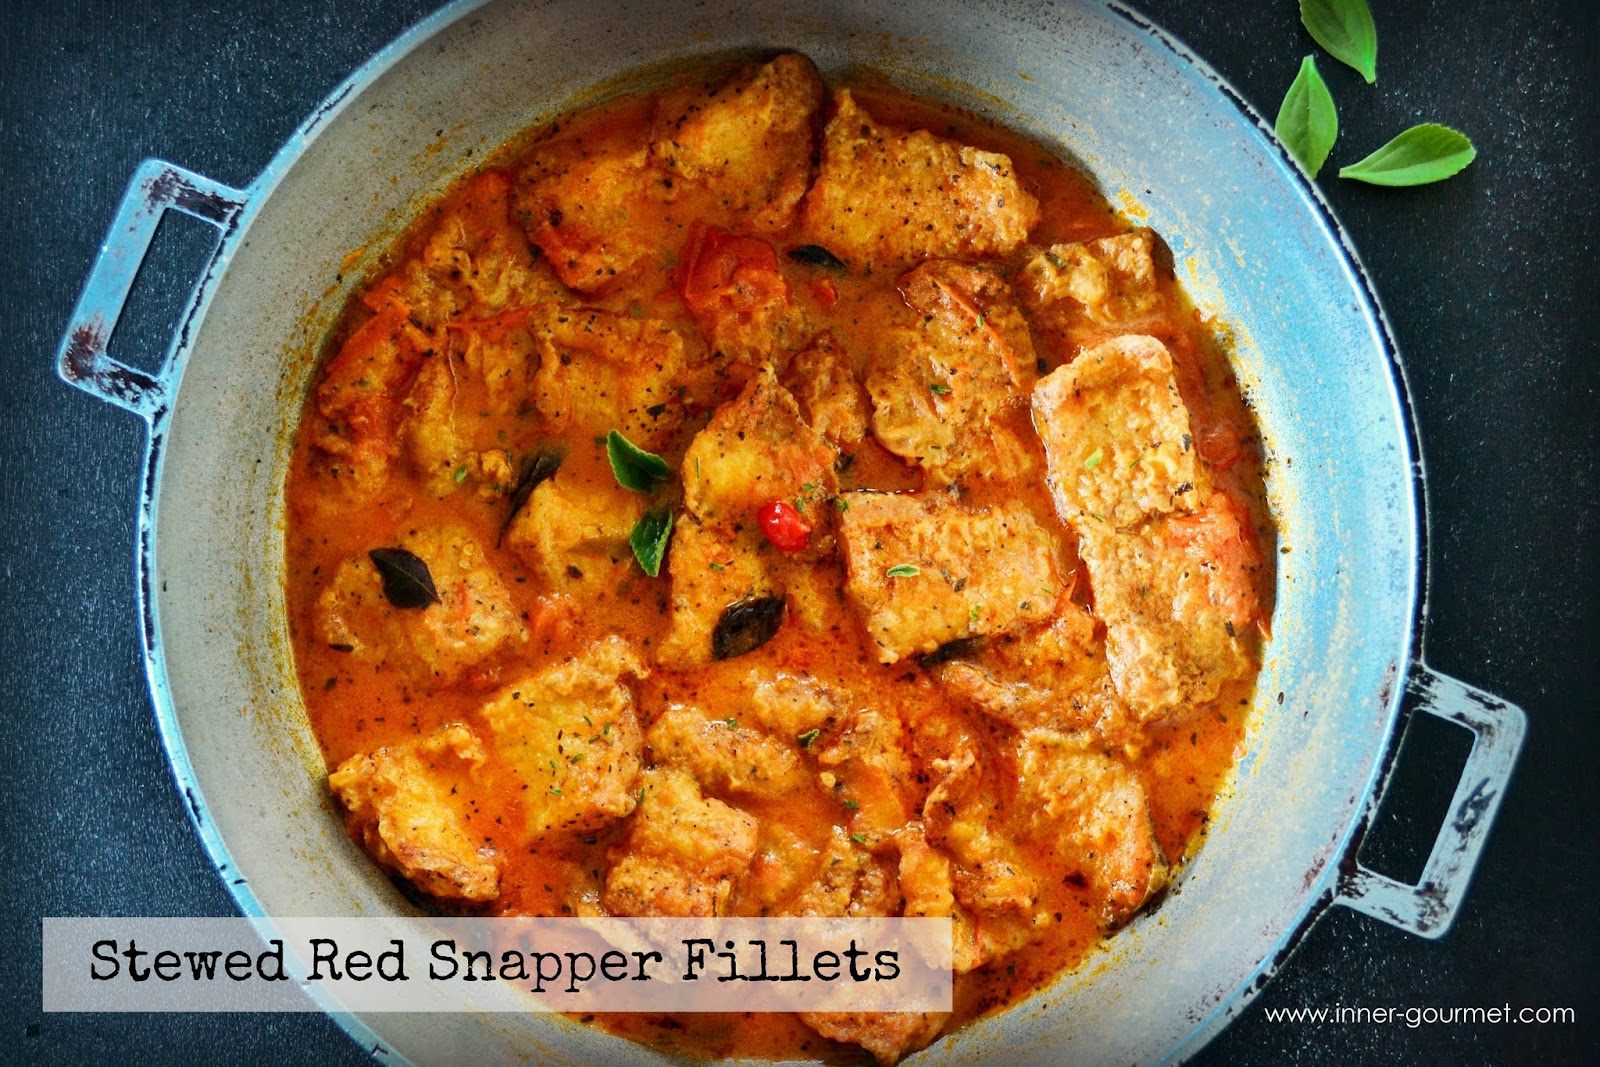 Stewed Red Snapper fillets